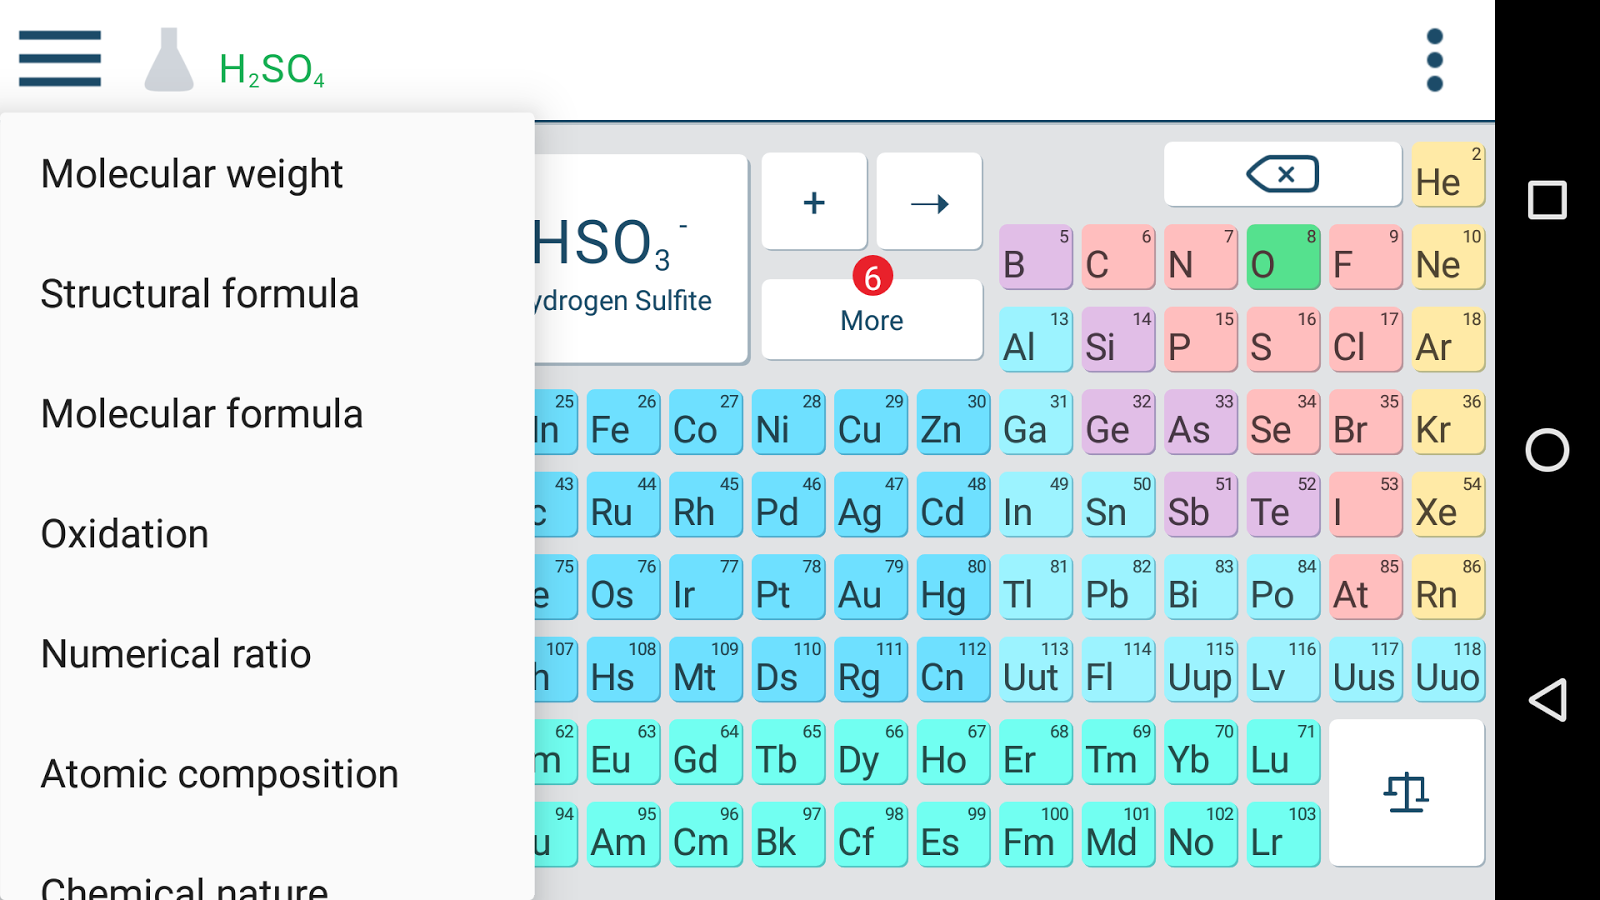 Free chemistry homework help